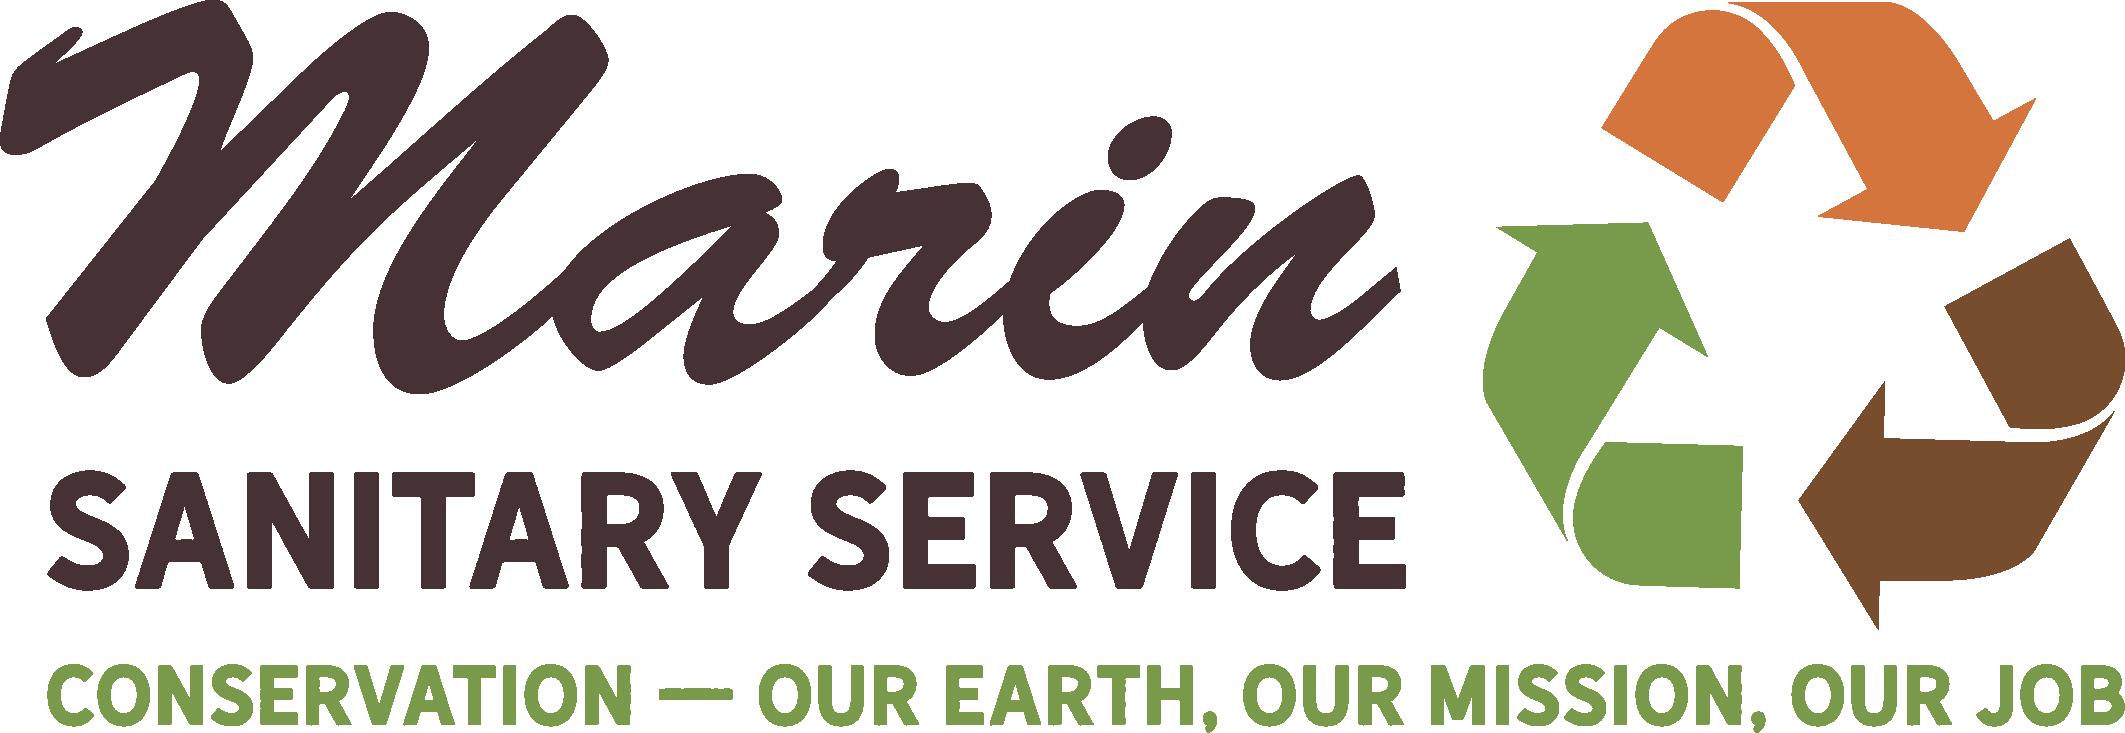 Presenting Sponsor - Marin Sanitary Service - Logo